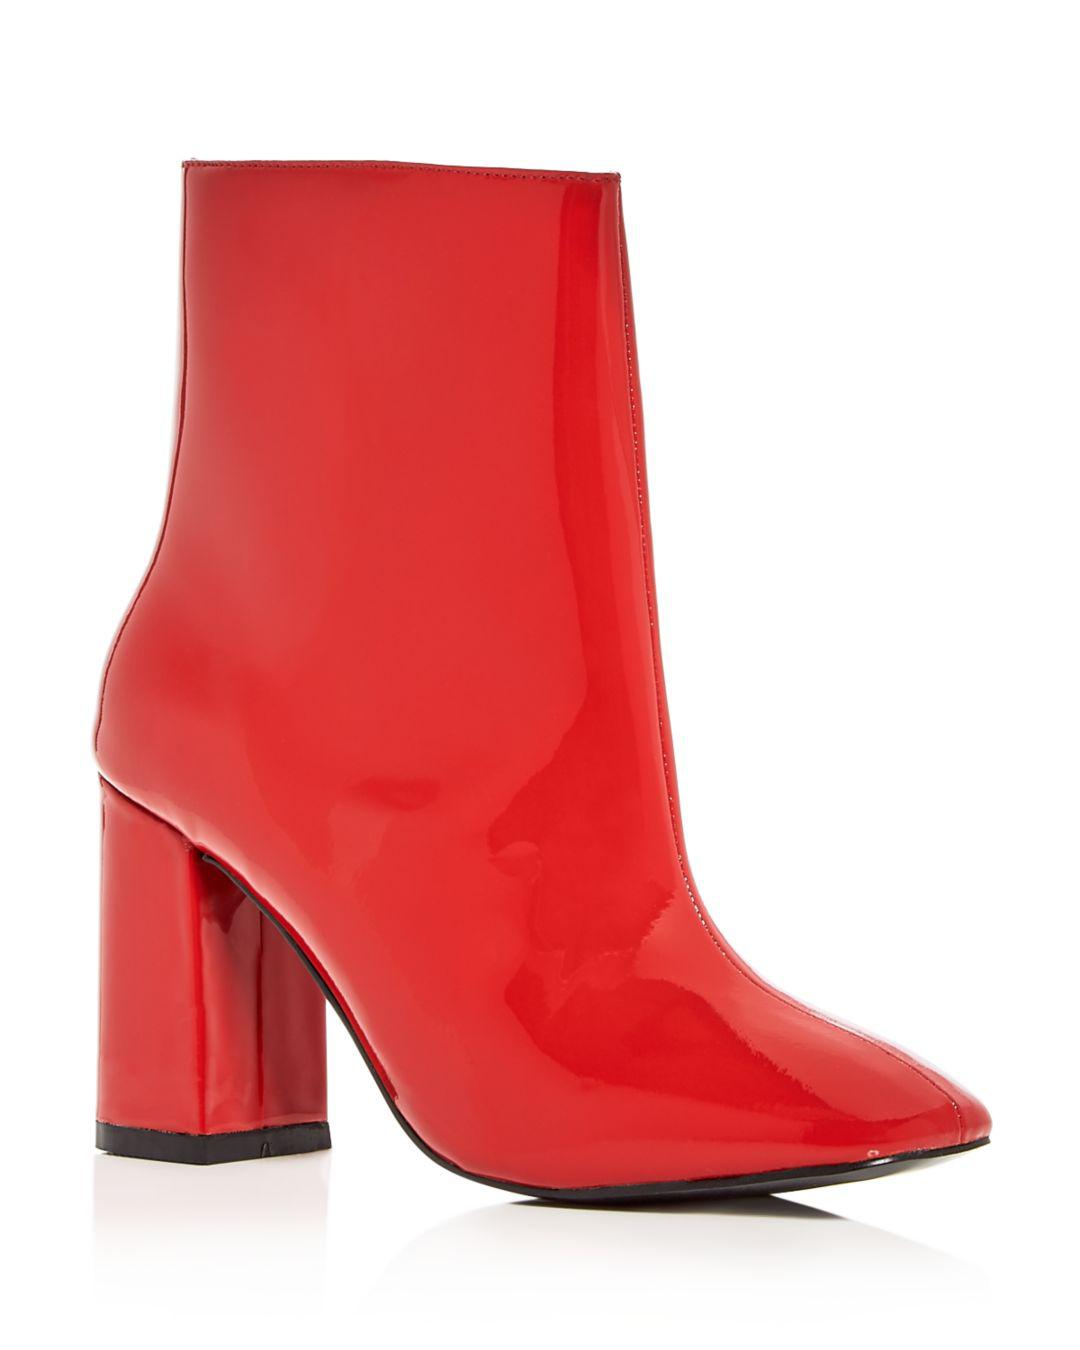 1acaa1c13b2cd Jaggar Women's Patent Leather Block Heel Booties in Red - Lyst